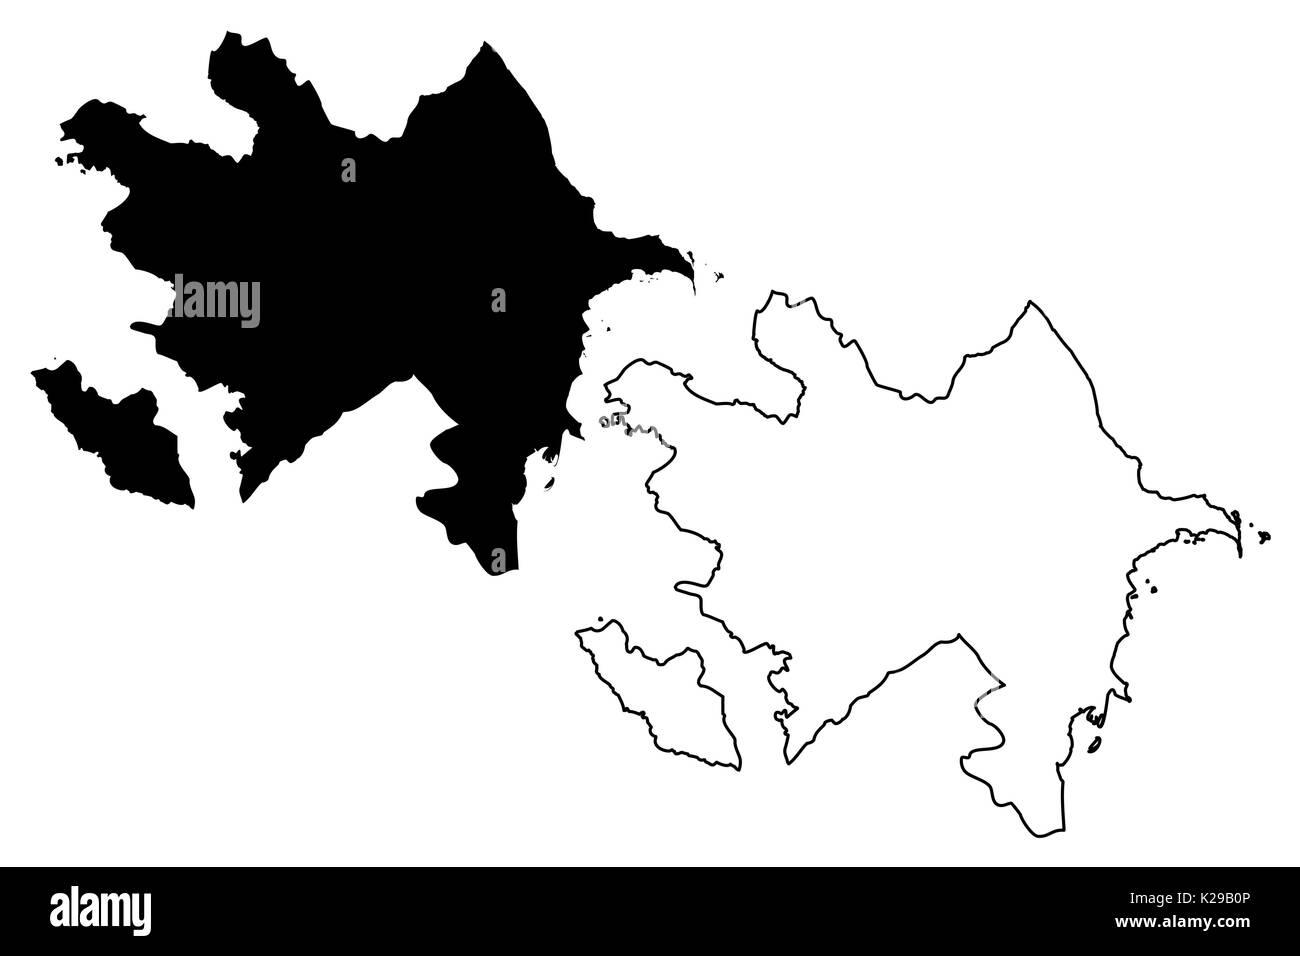 Azerbaijan map vector illustration, scribble sketch Azerbaijan - Stock Image